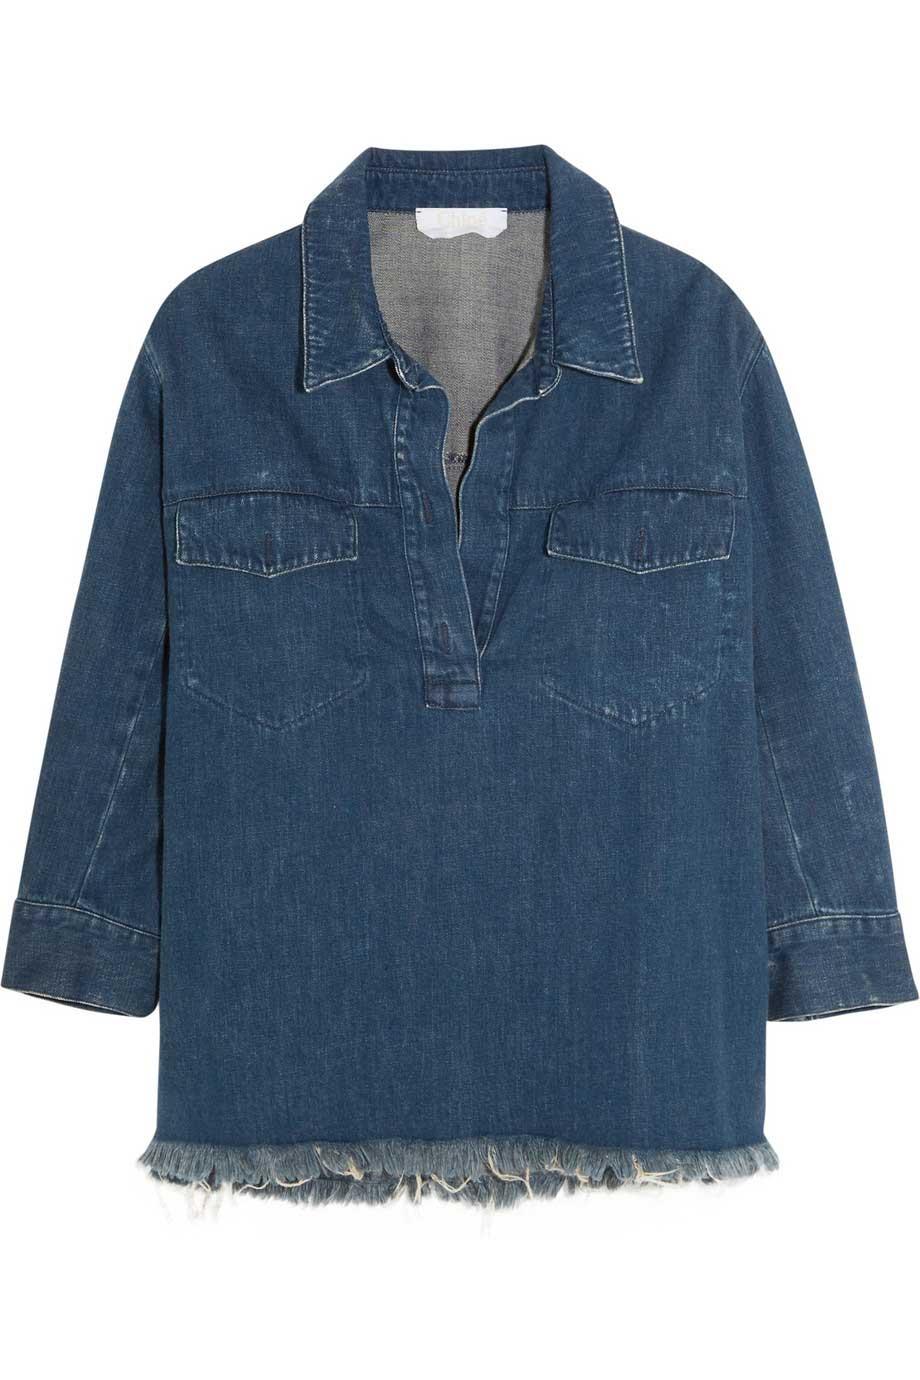 Oversized frayed denim shirt, £425, Chloé. www.net-a-porter.com